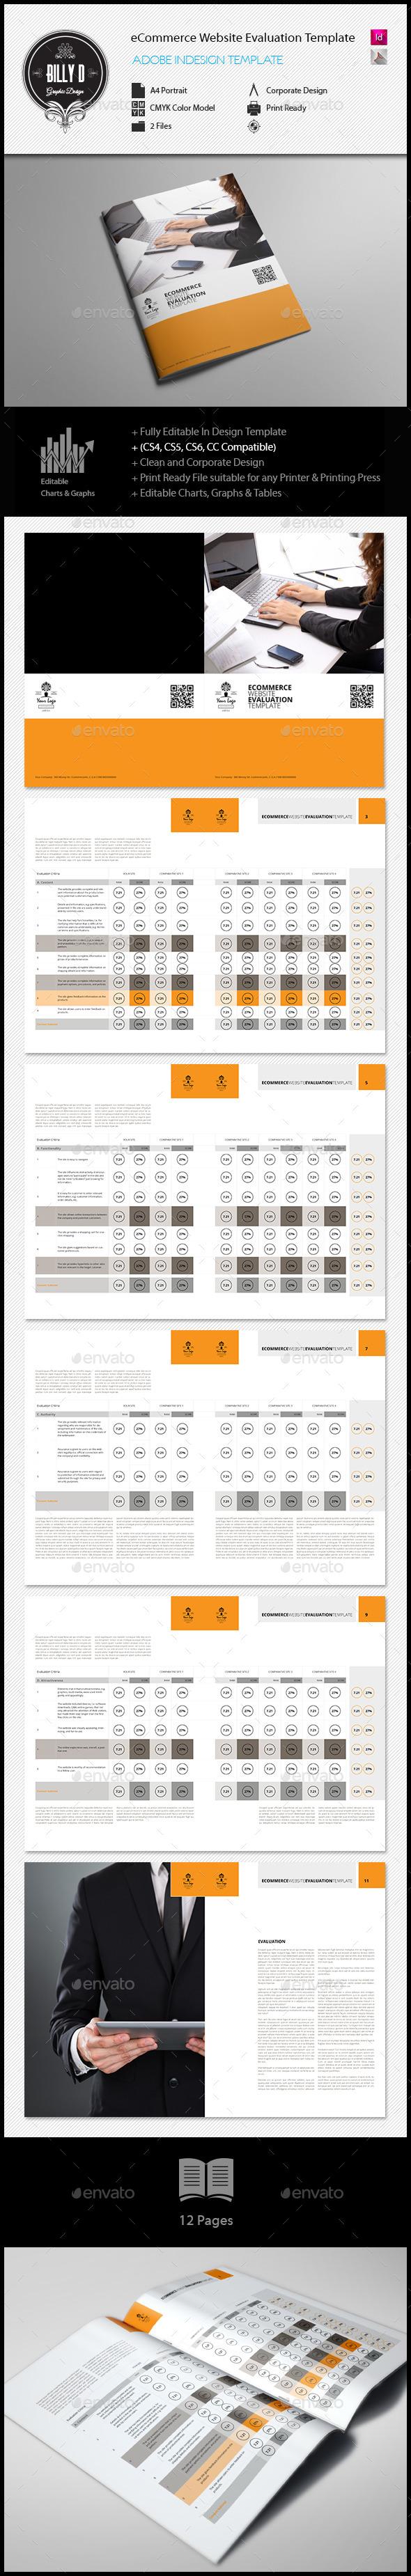 Ecommerce Website Evaluation Template | Pinterest | eCommerce ...